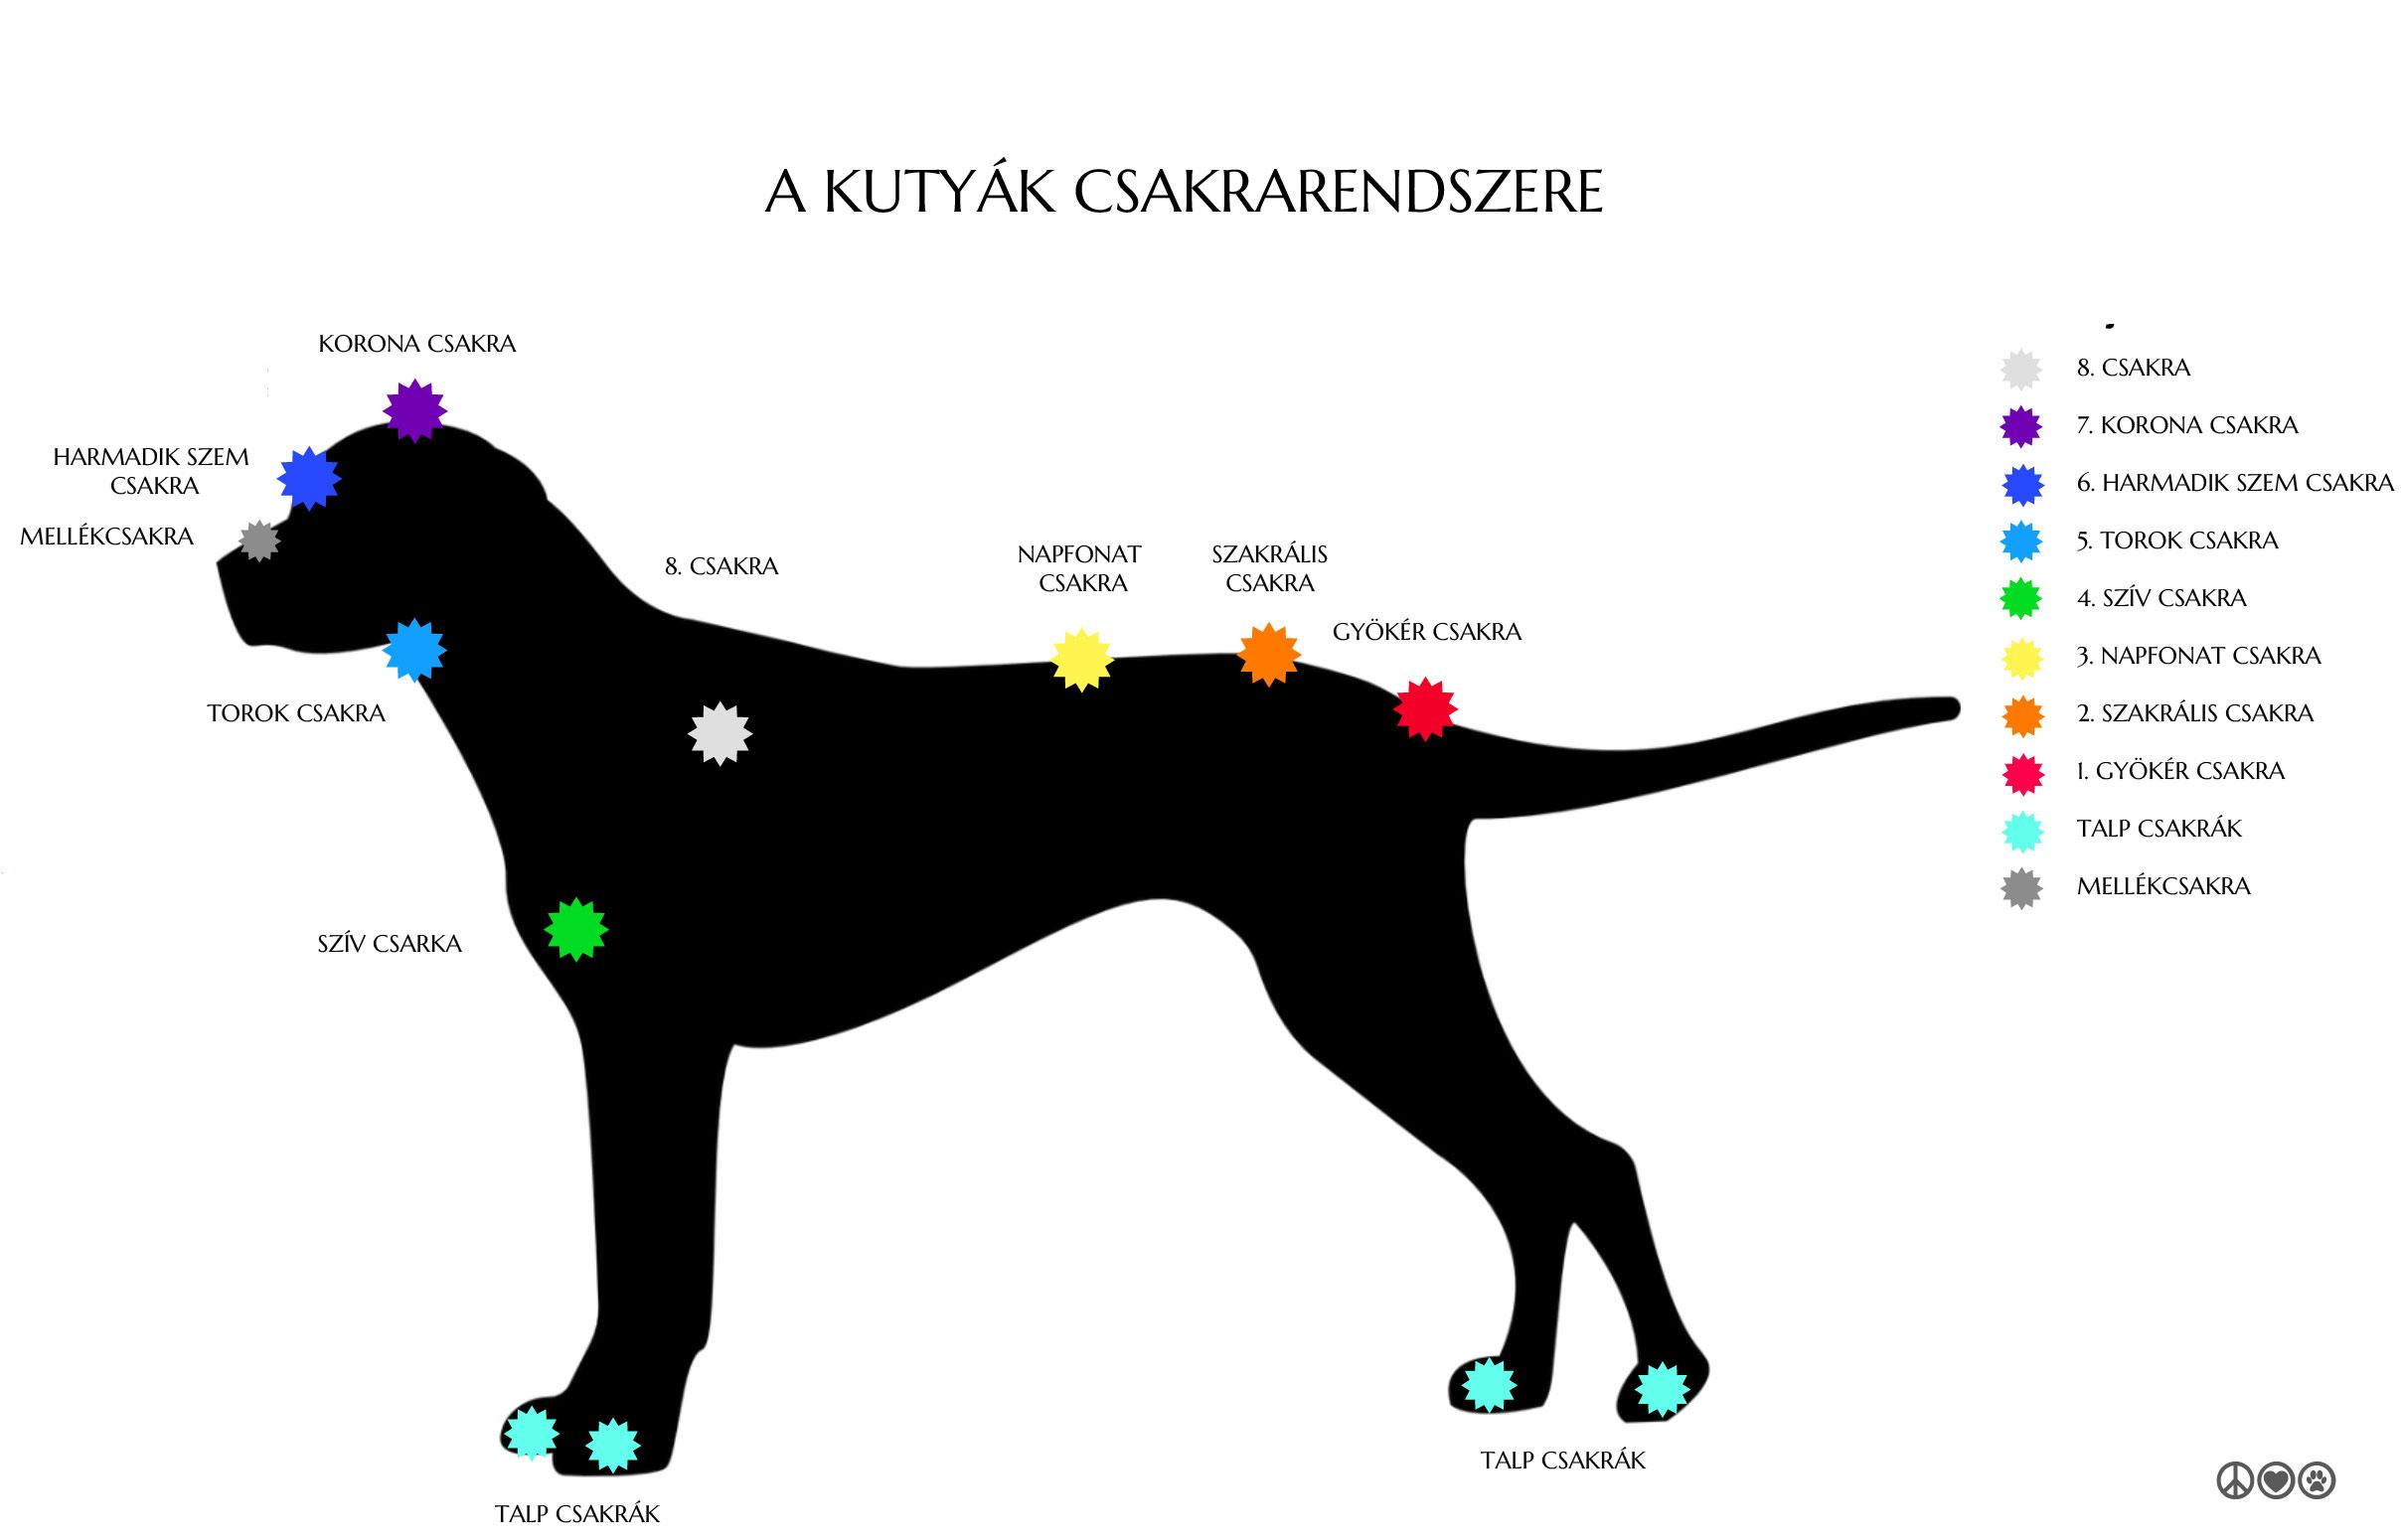 kutyak-csakra-rendszere.jpg